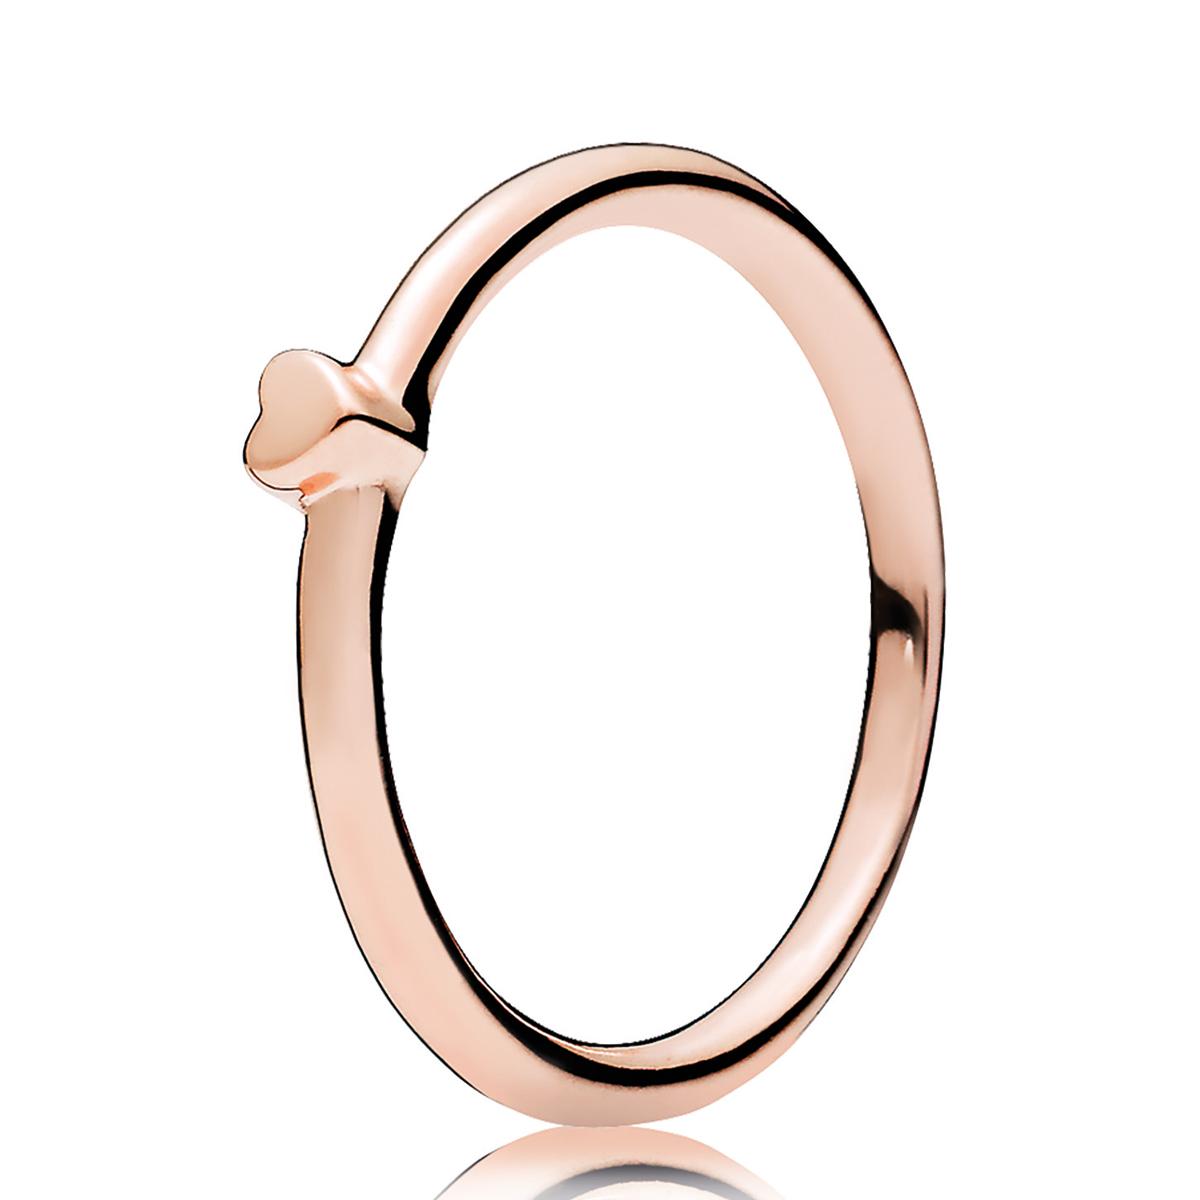 PANDORA Rose Gold Puzzle Heart Ring - Pancharmbracelets.com